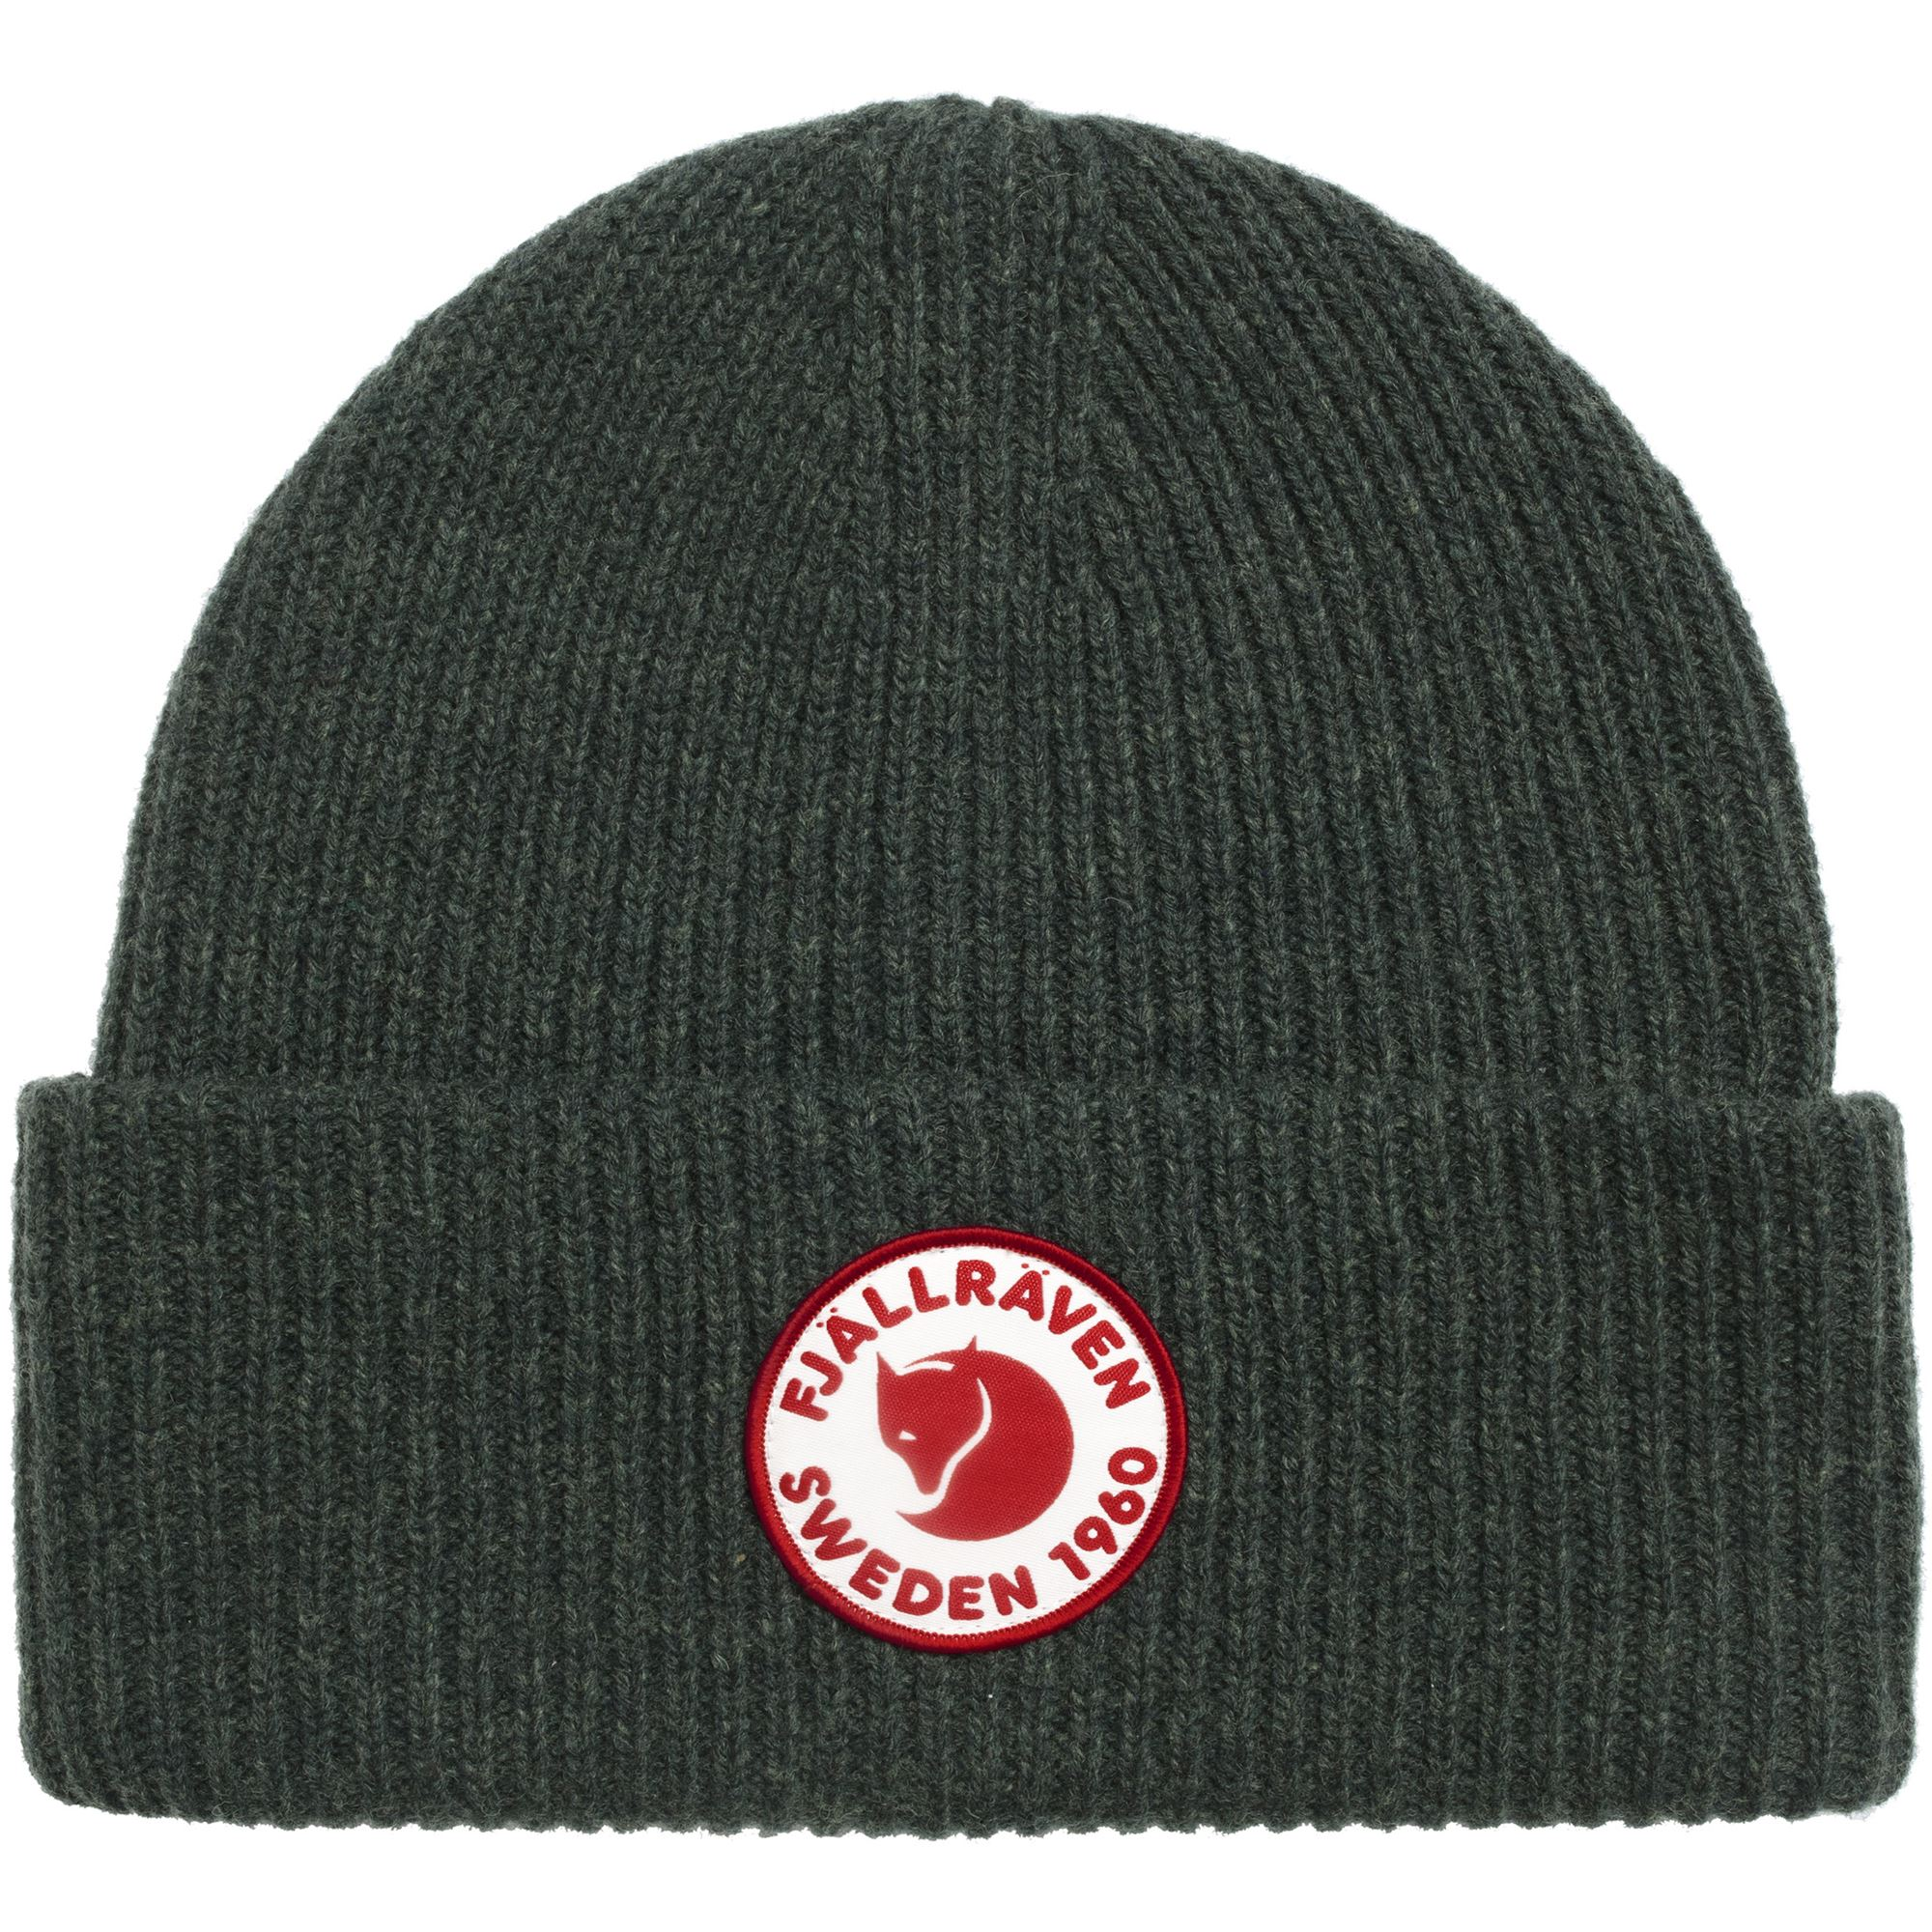 Fjällräven 1960 Logo hat, deep forest, onesize